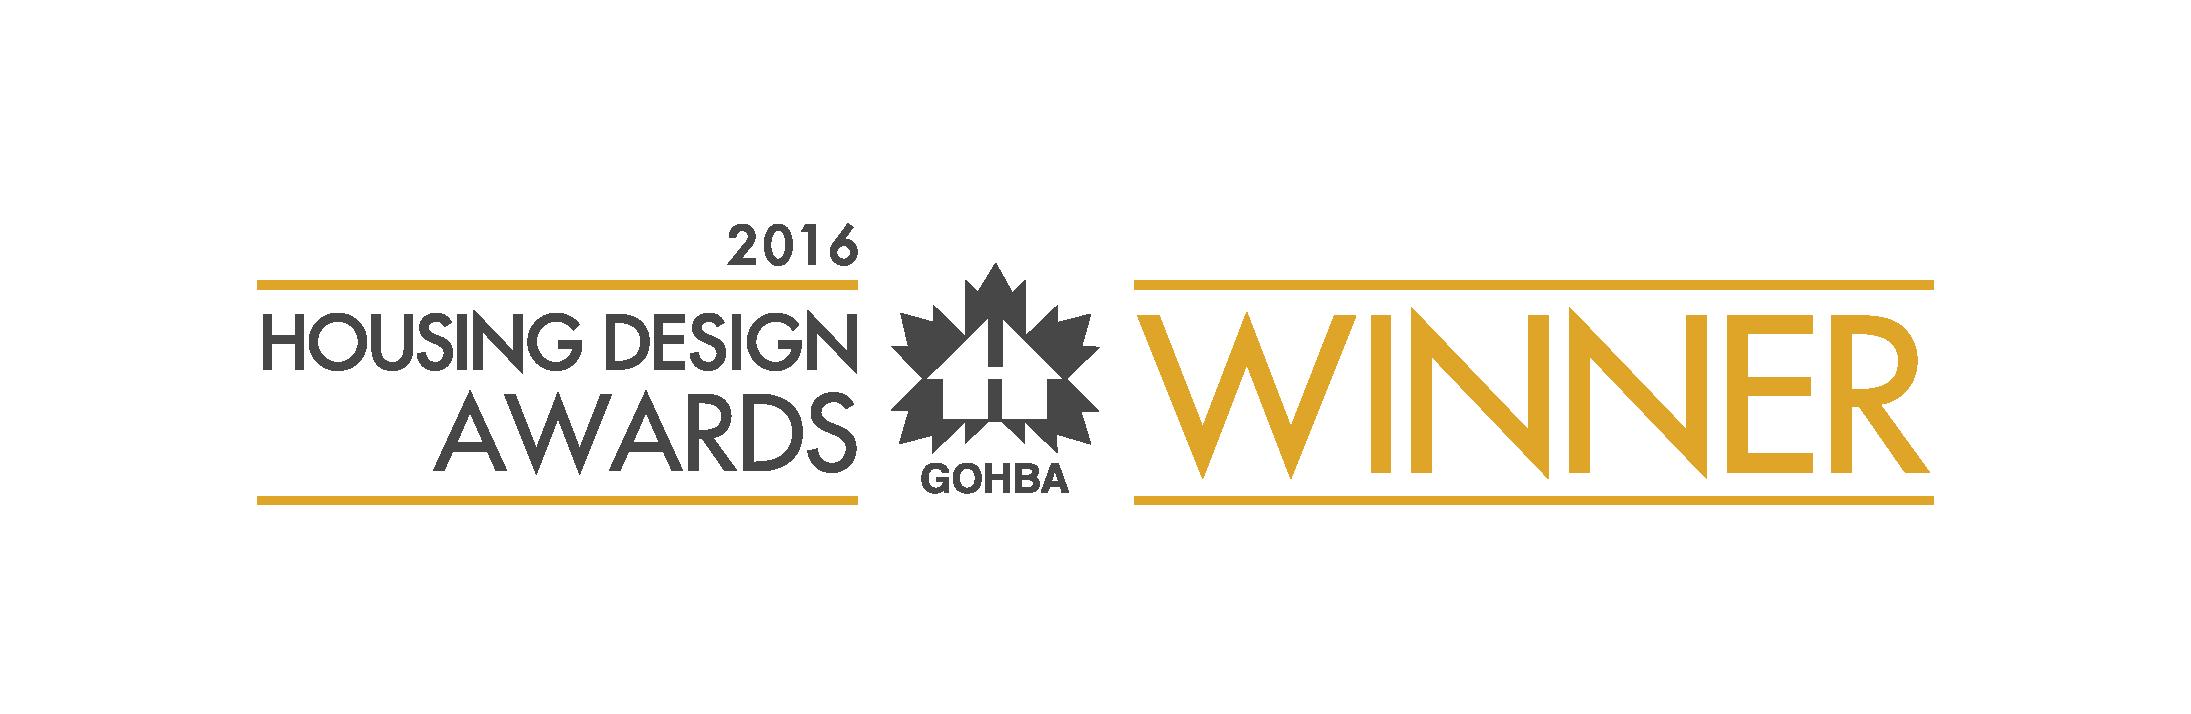 160067_GOHB_HDA_Finalist_Winner_Logos_FINAL-8